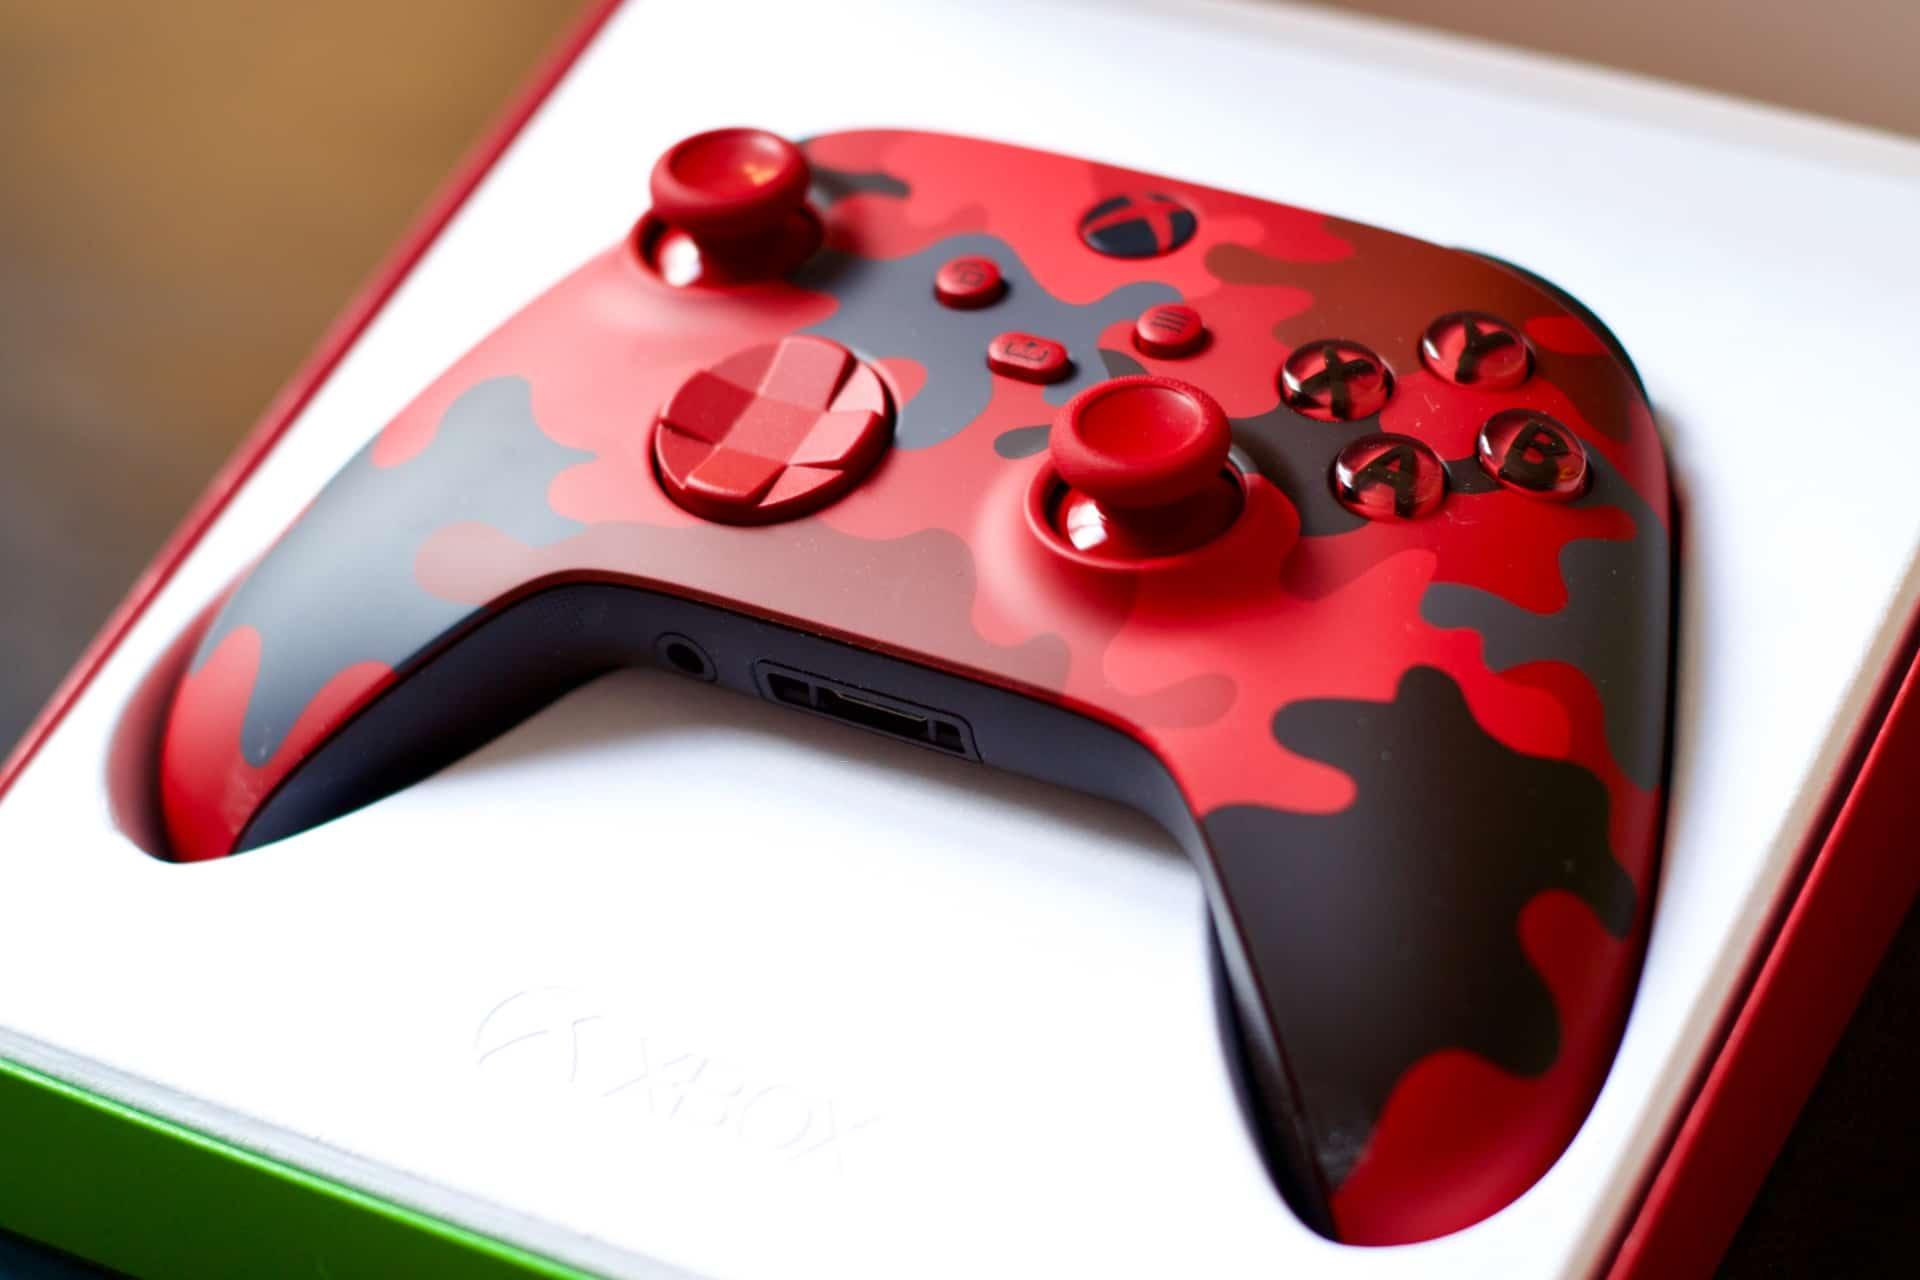 Manette Xbox Daystrike Camo